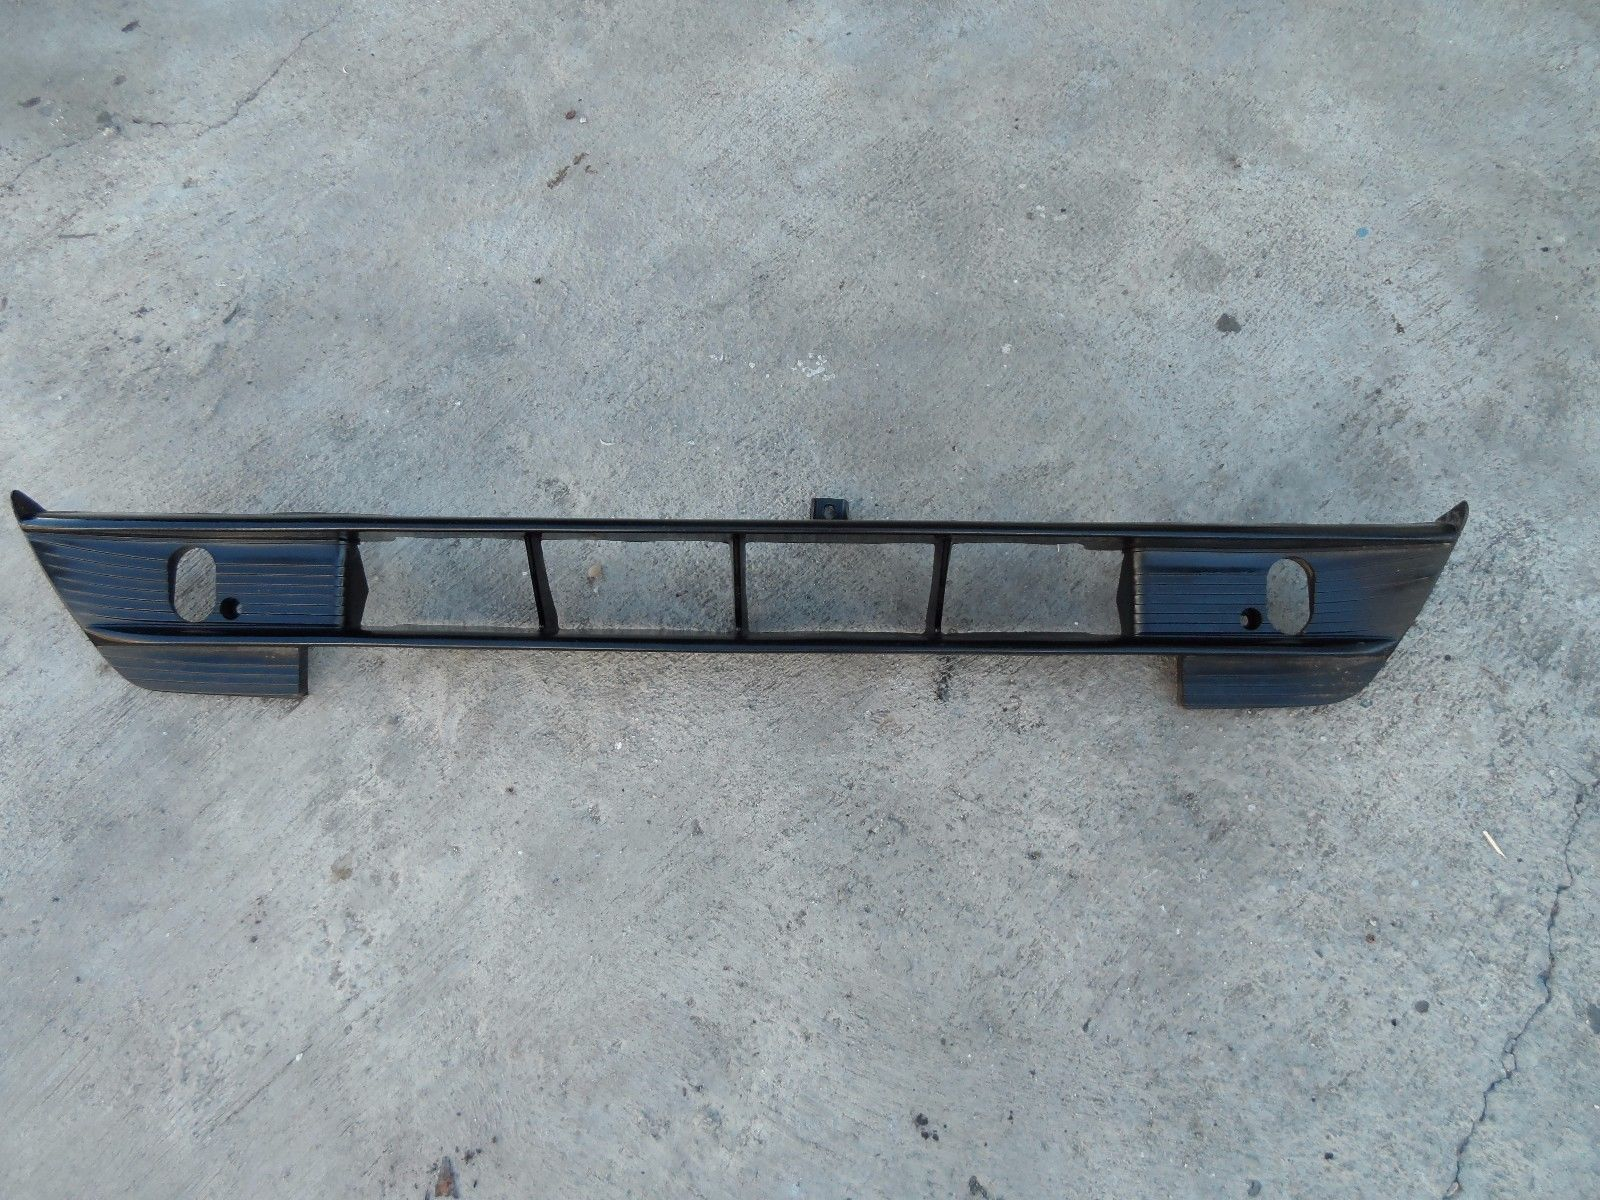 CHROME REAR VIEW MIRRORS NEW FITS FOR DATSUN FAIRLADY 240Z 260Z 280Z S30 S130